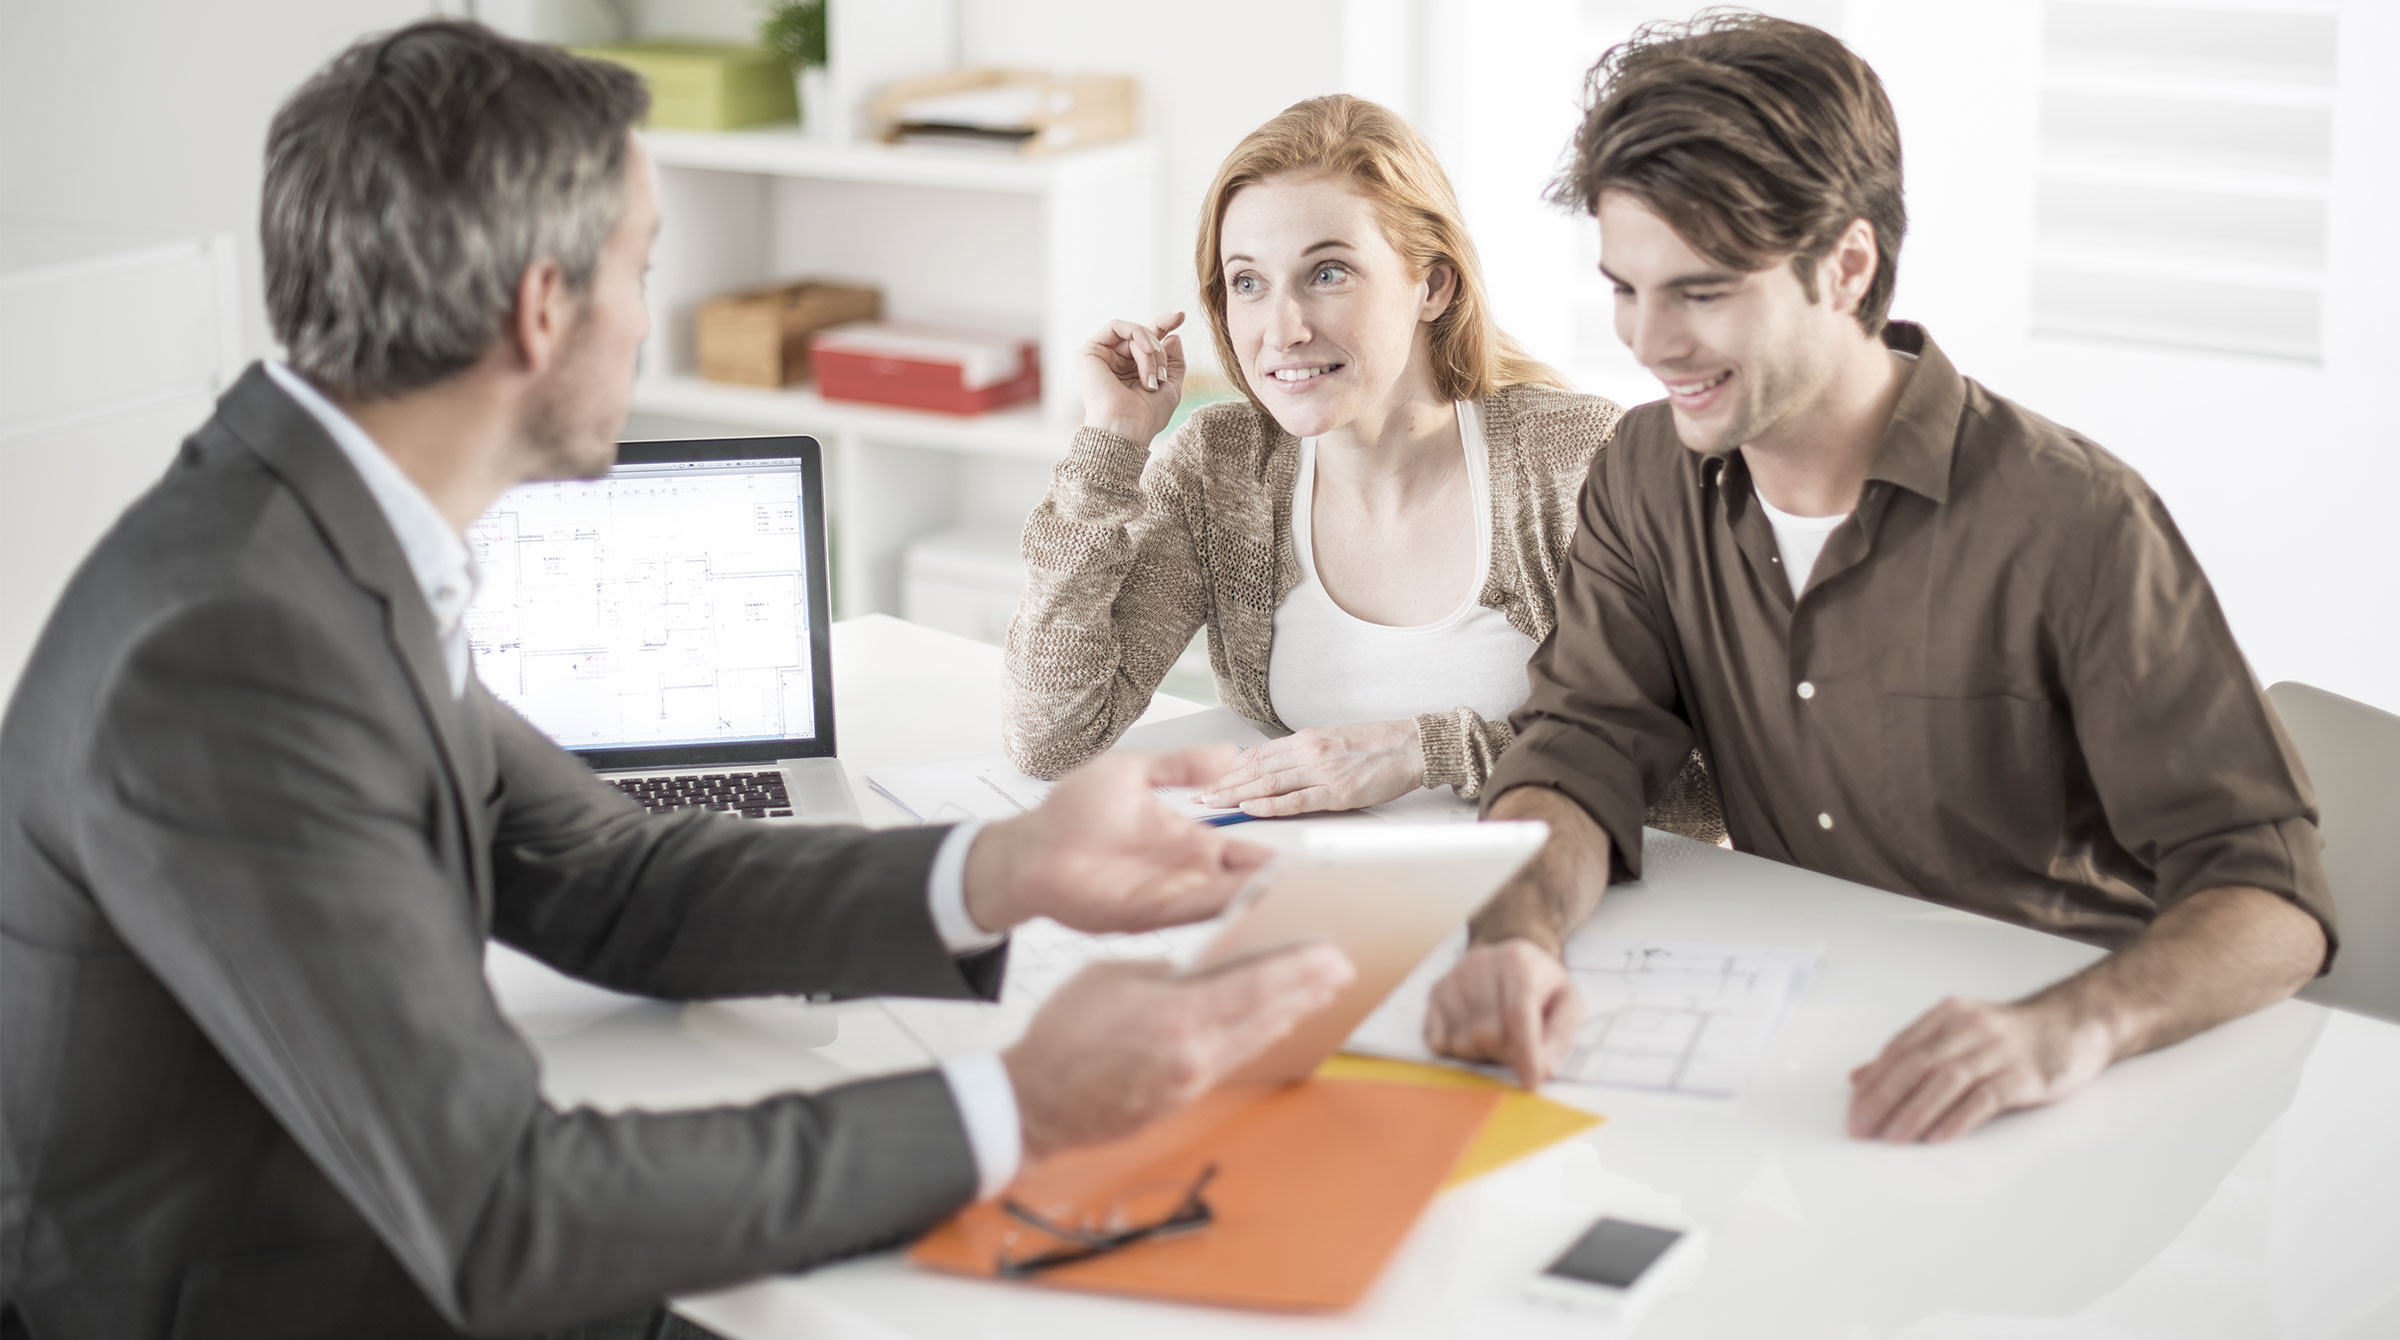 Teaserbild Immobilienfinanzierung